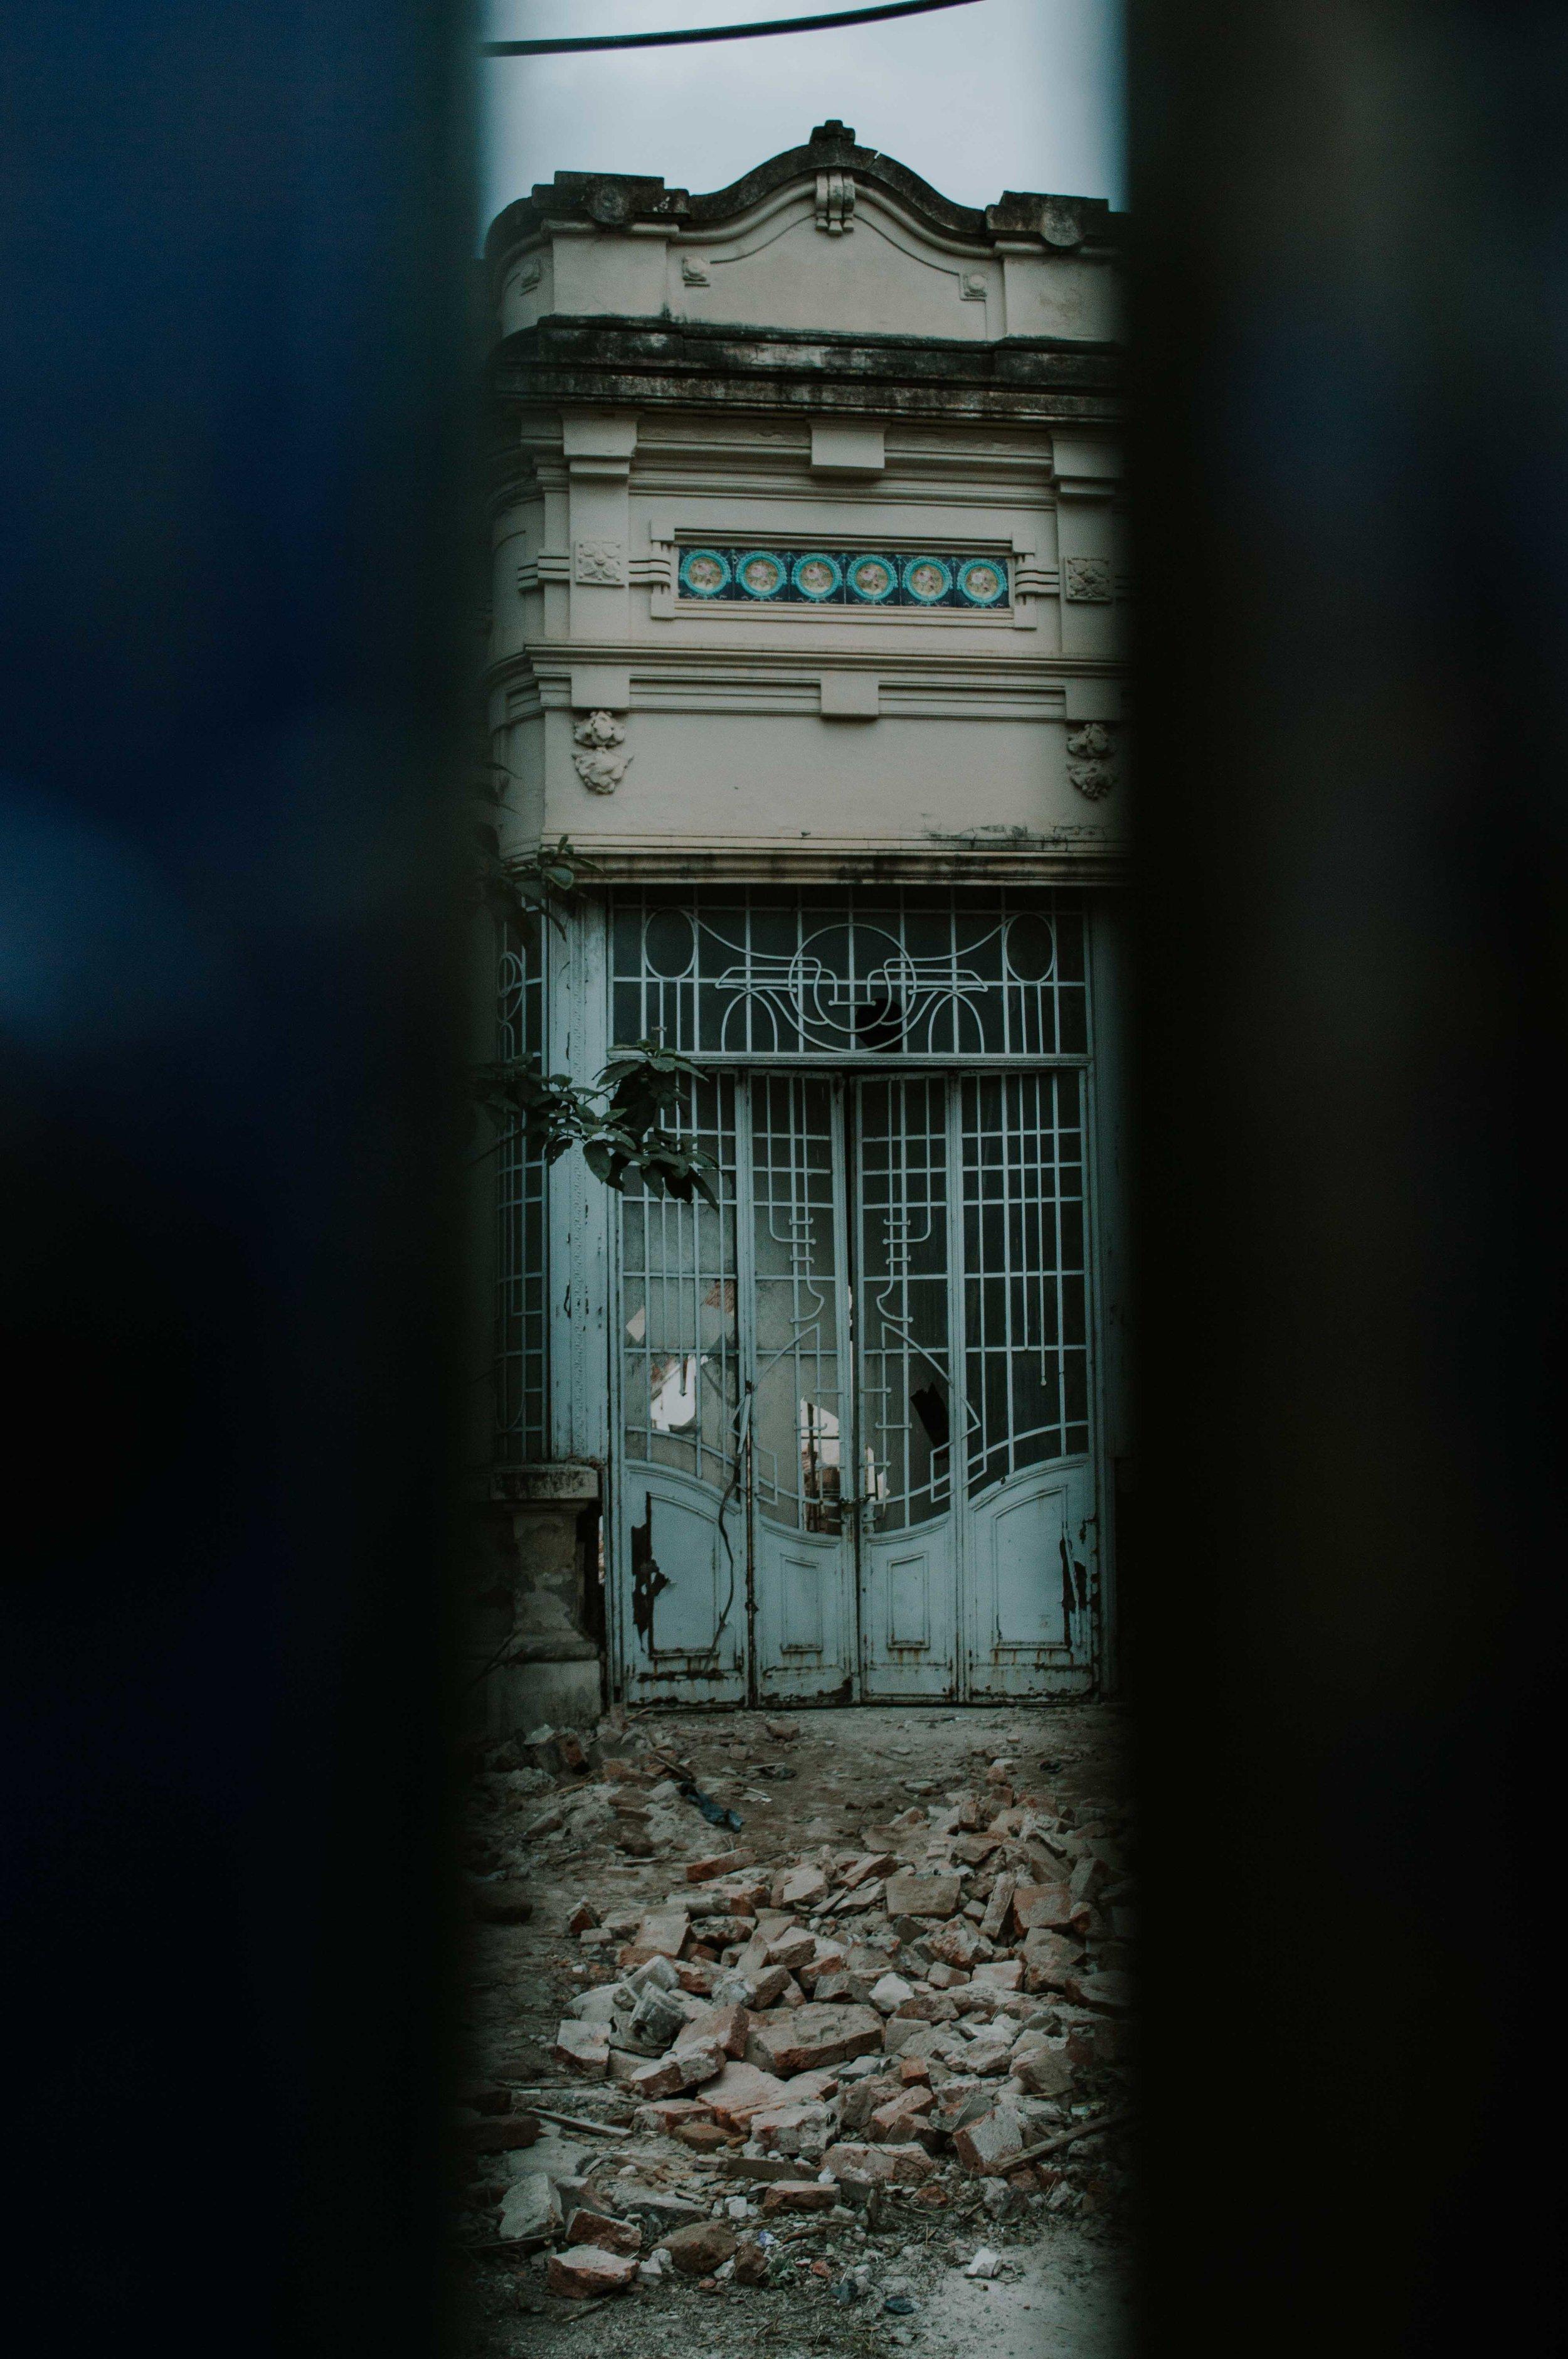 Demoler el viejo urbanismo - Agostina Rossini-5.jpg